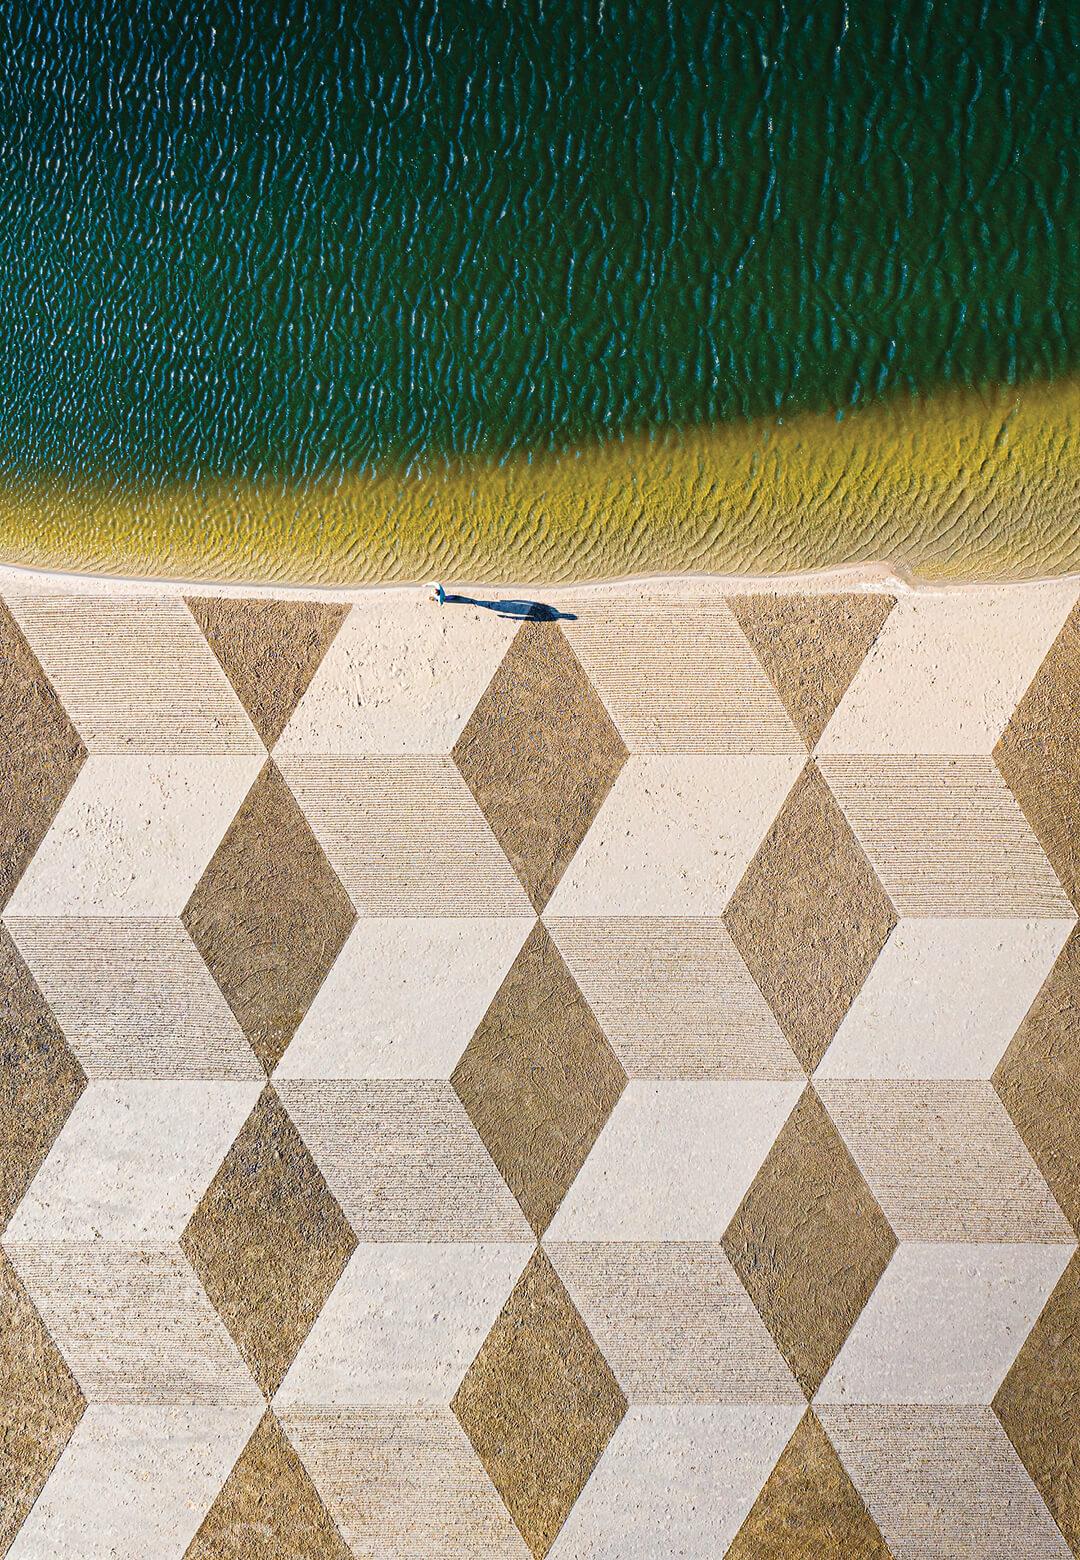 Sand and Water| | Nico Laan | STIRworld